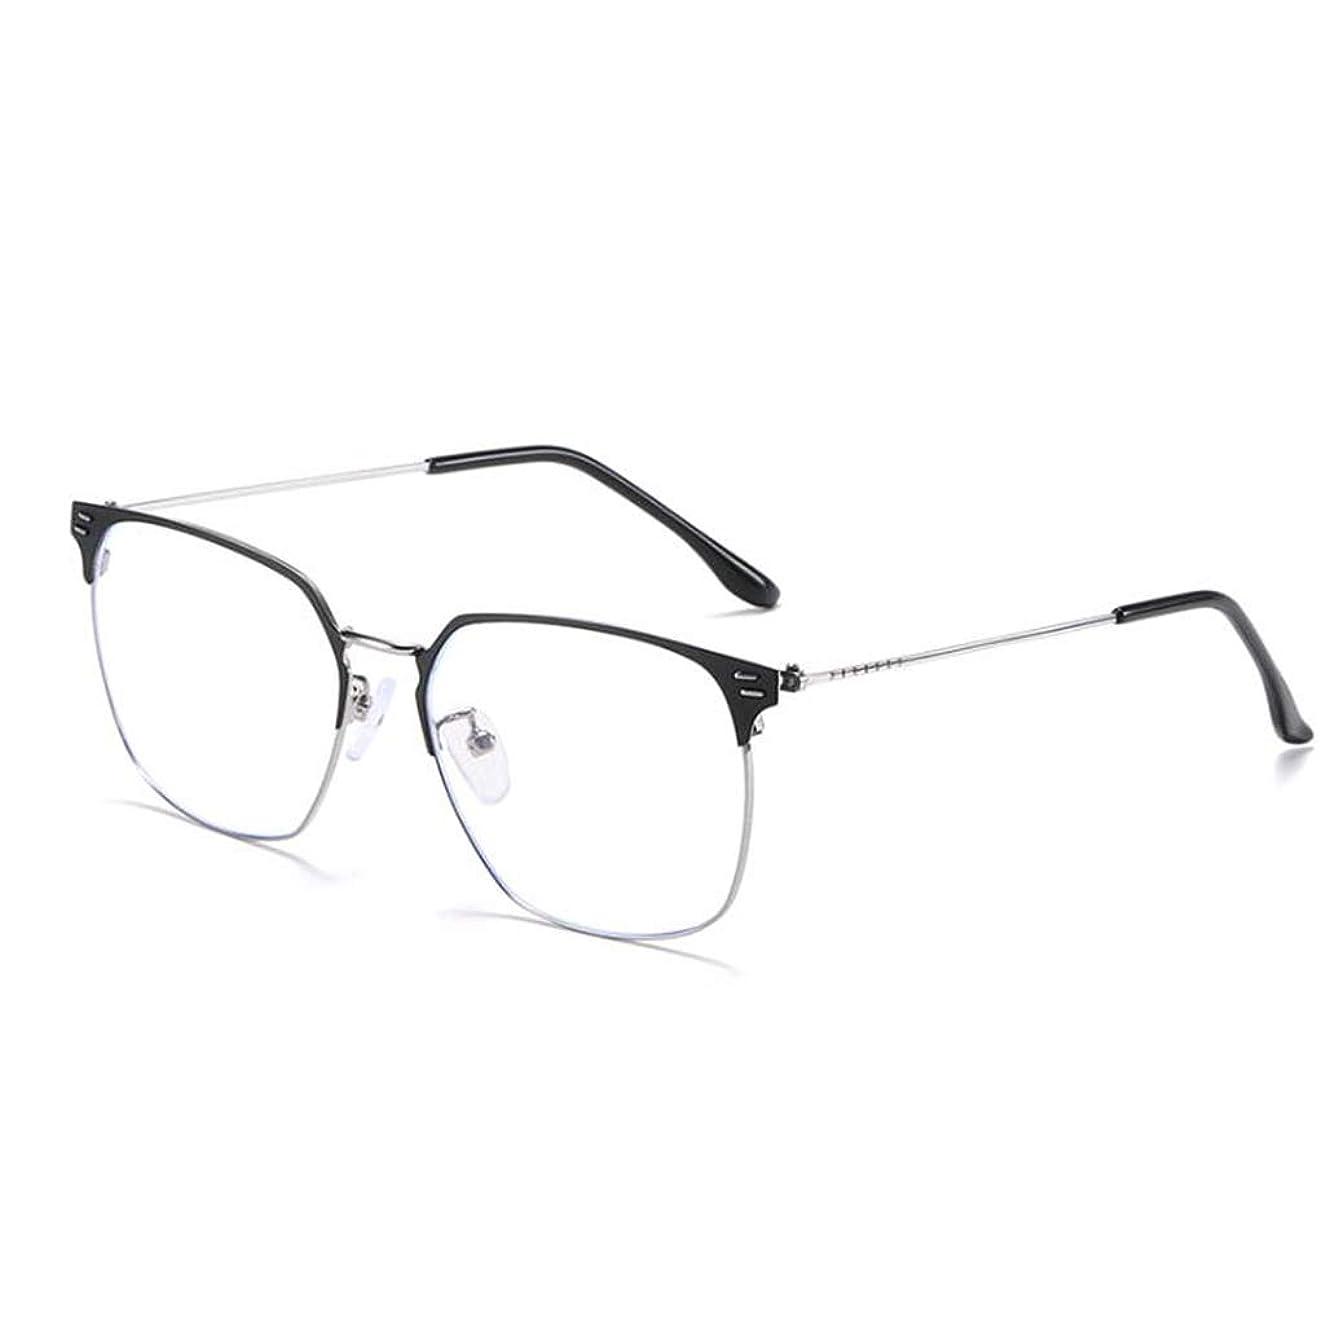 HHL Non-Prescription Anti Blue Light Glasses,Business Metal Frame Protect Eyes,Reading Eyewear,Men (Color : Dark Grey)